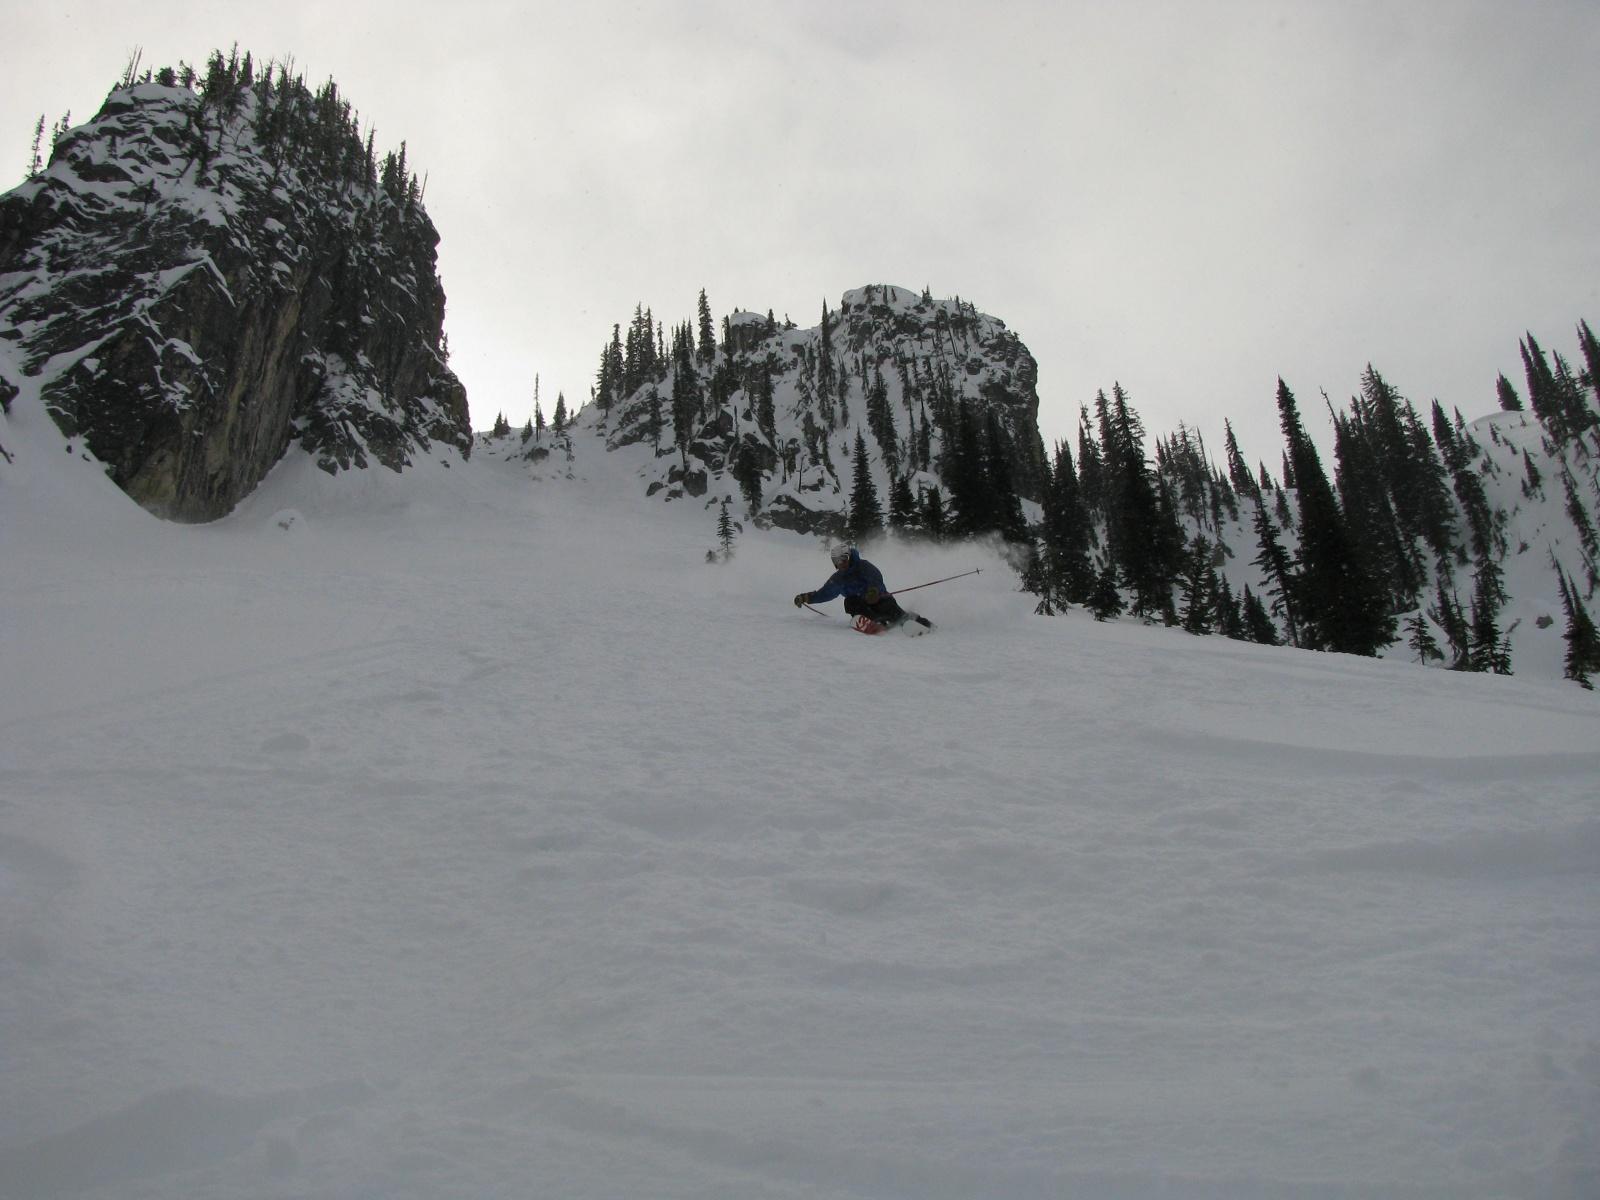 Click image for larger version  Name:British Columbia Ski Trip 046.jpg Views:99 Size:460.0 KB ID:1106